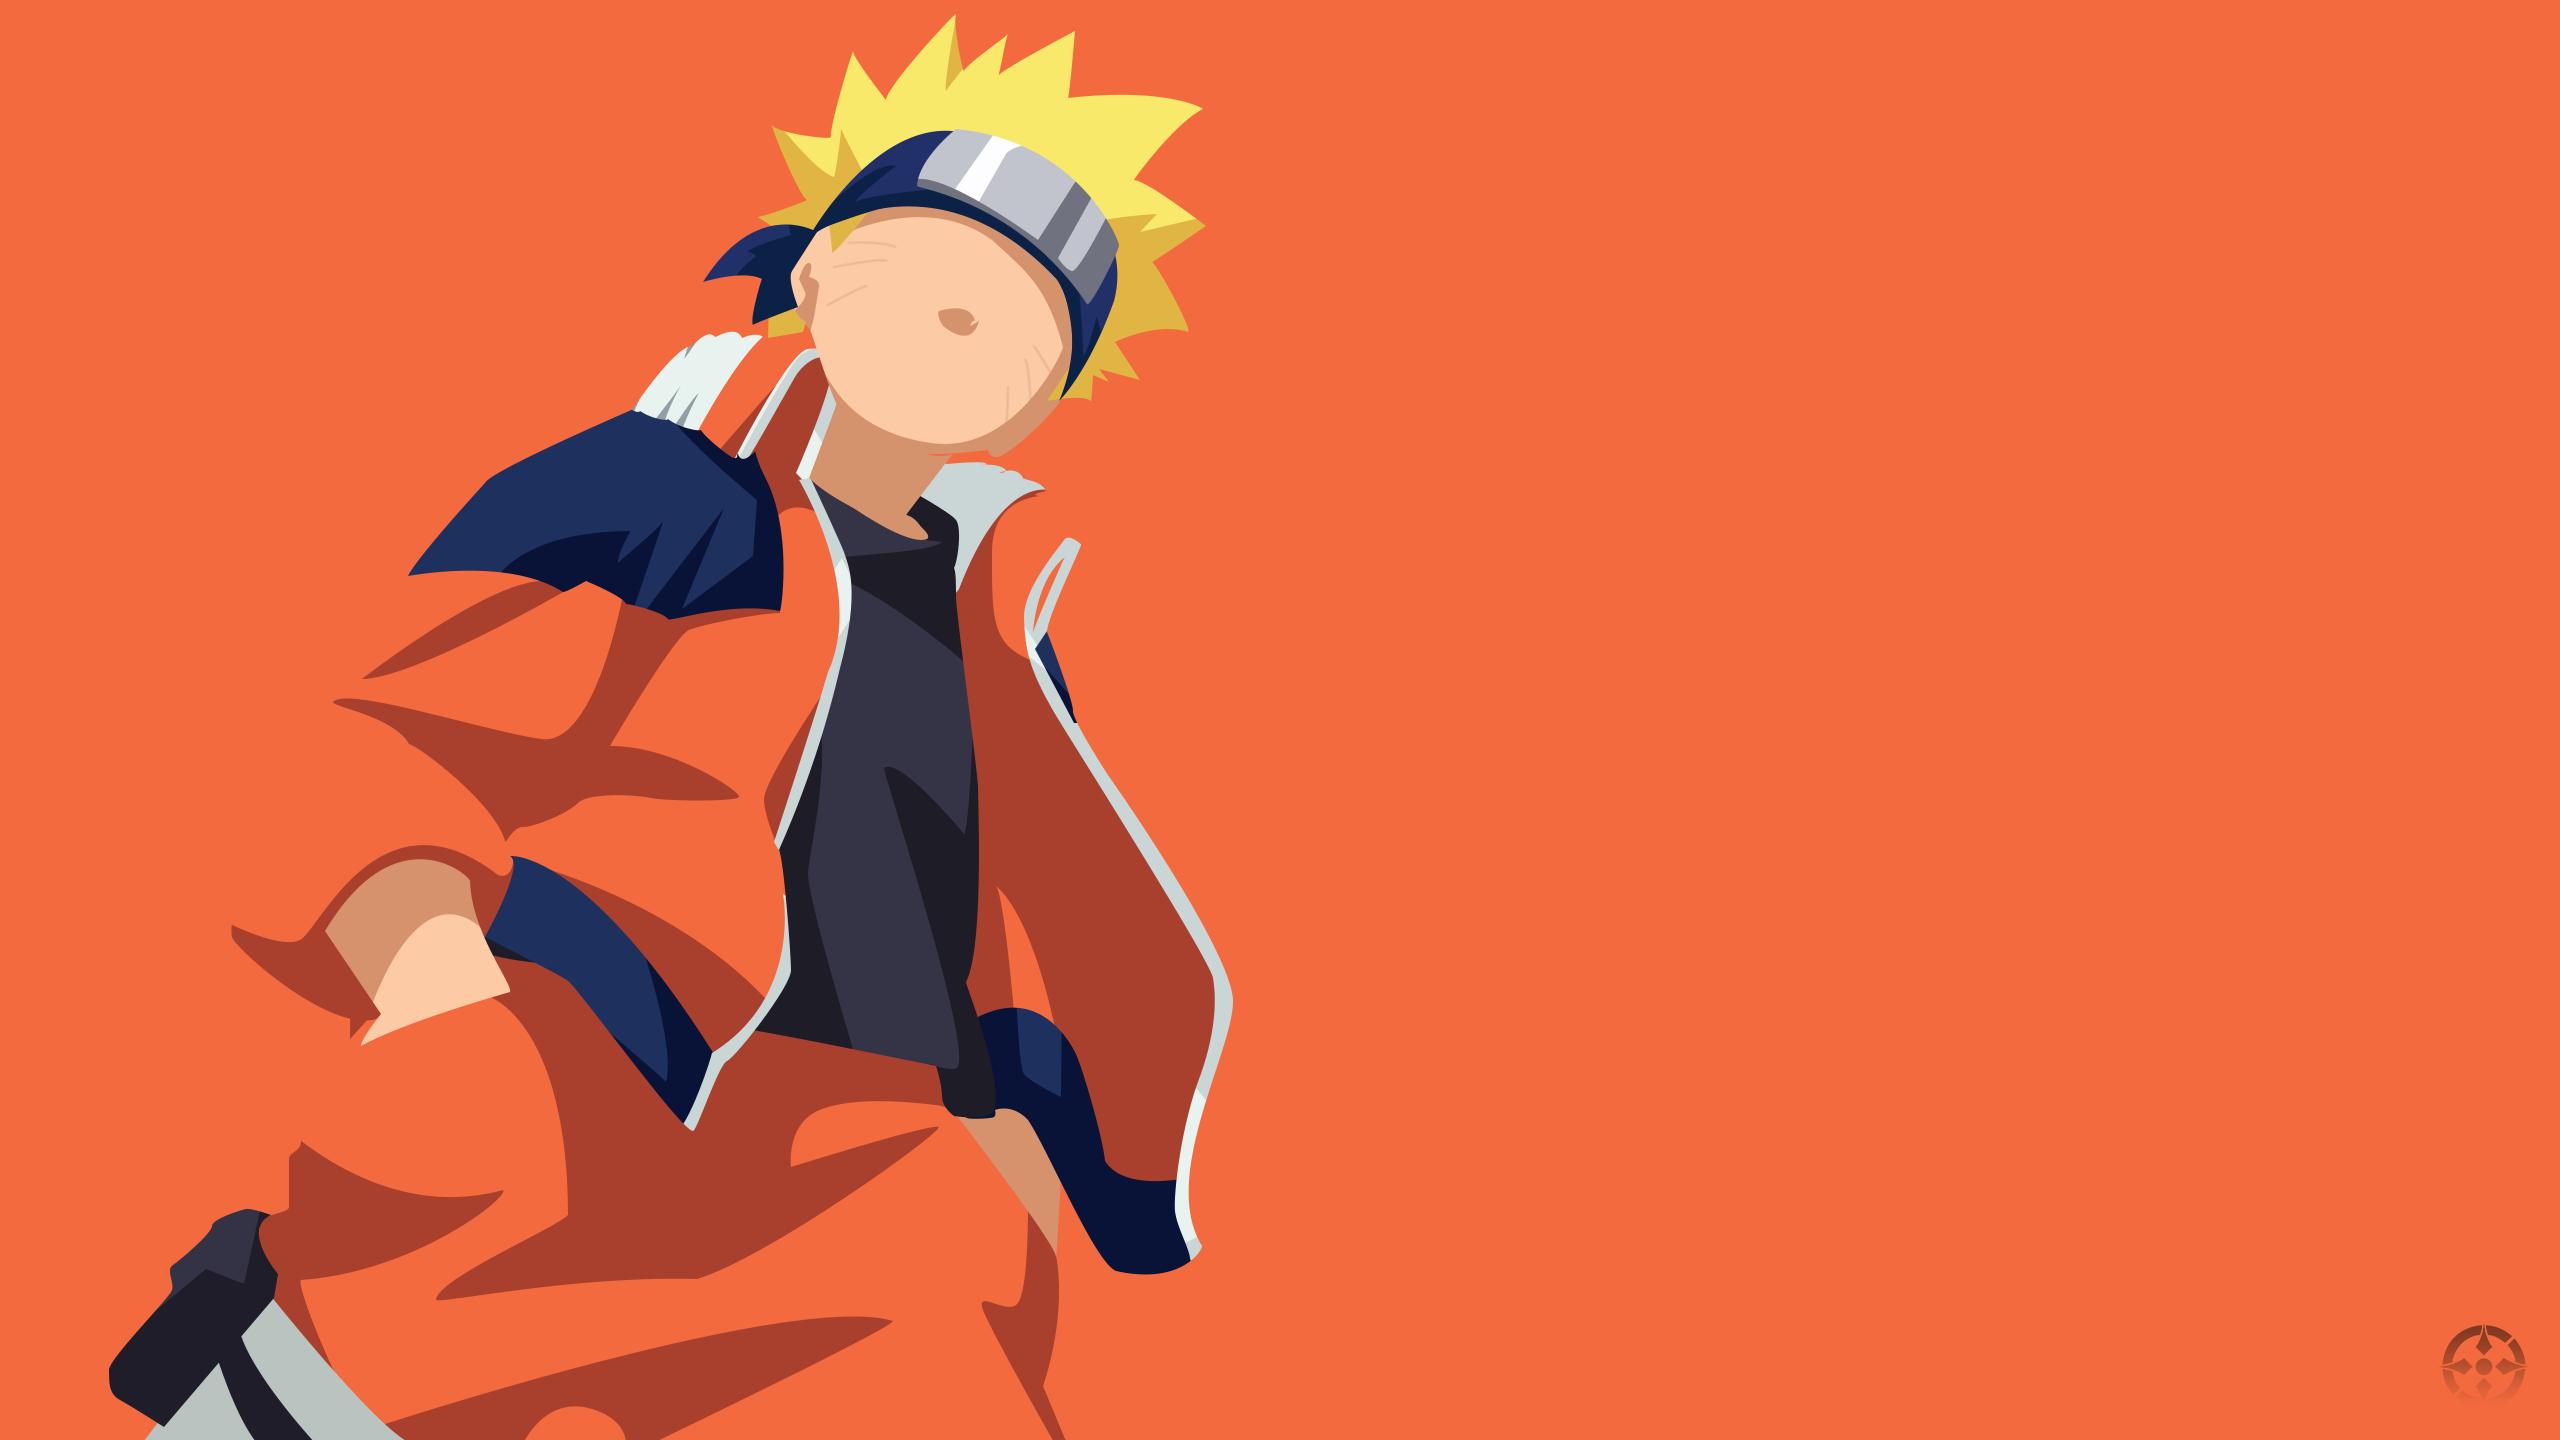 Naruto Uzumaki [ KID ] - Minimalist Design Wallpap by ...